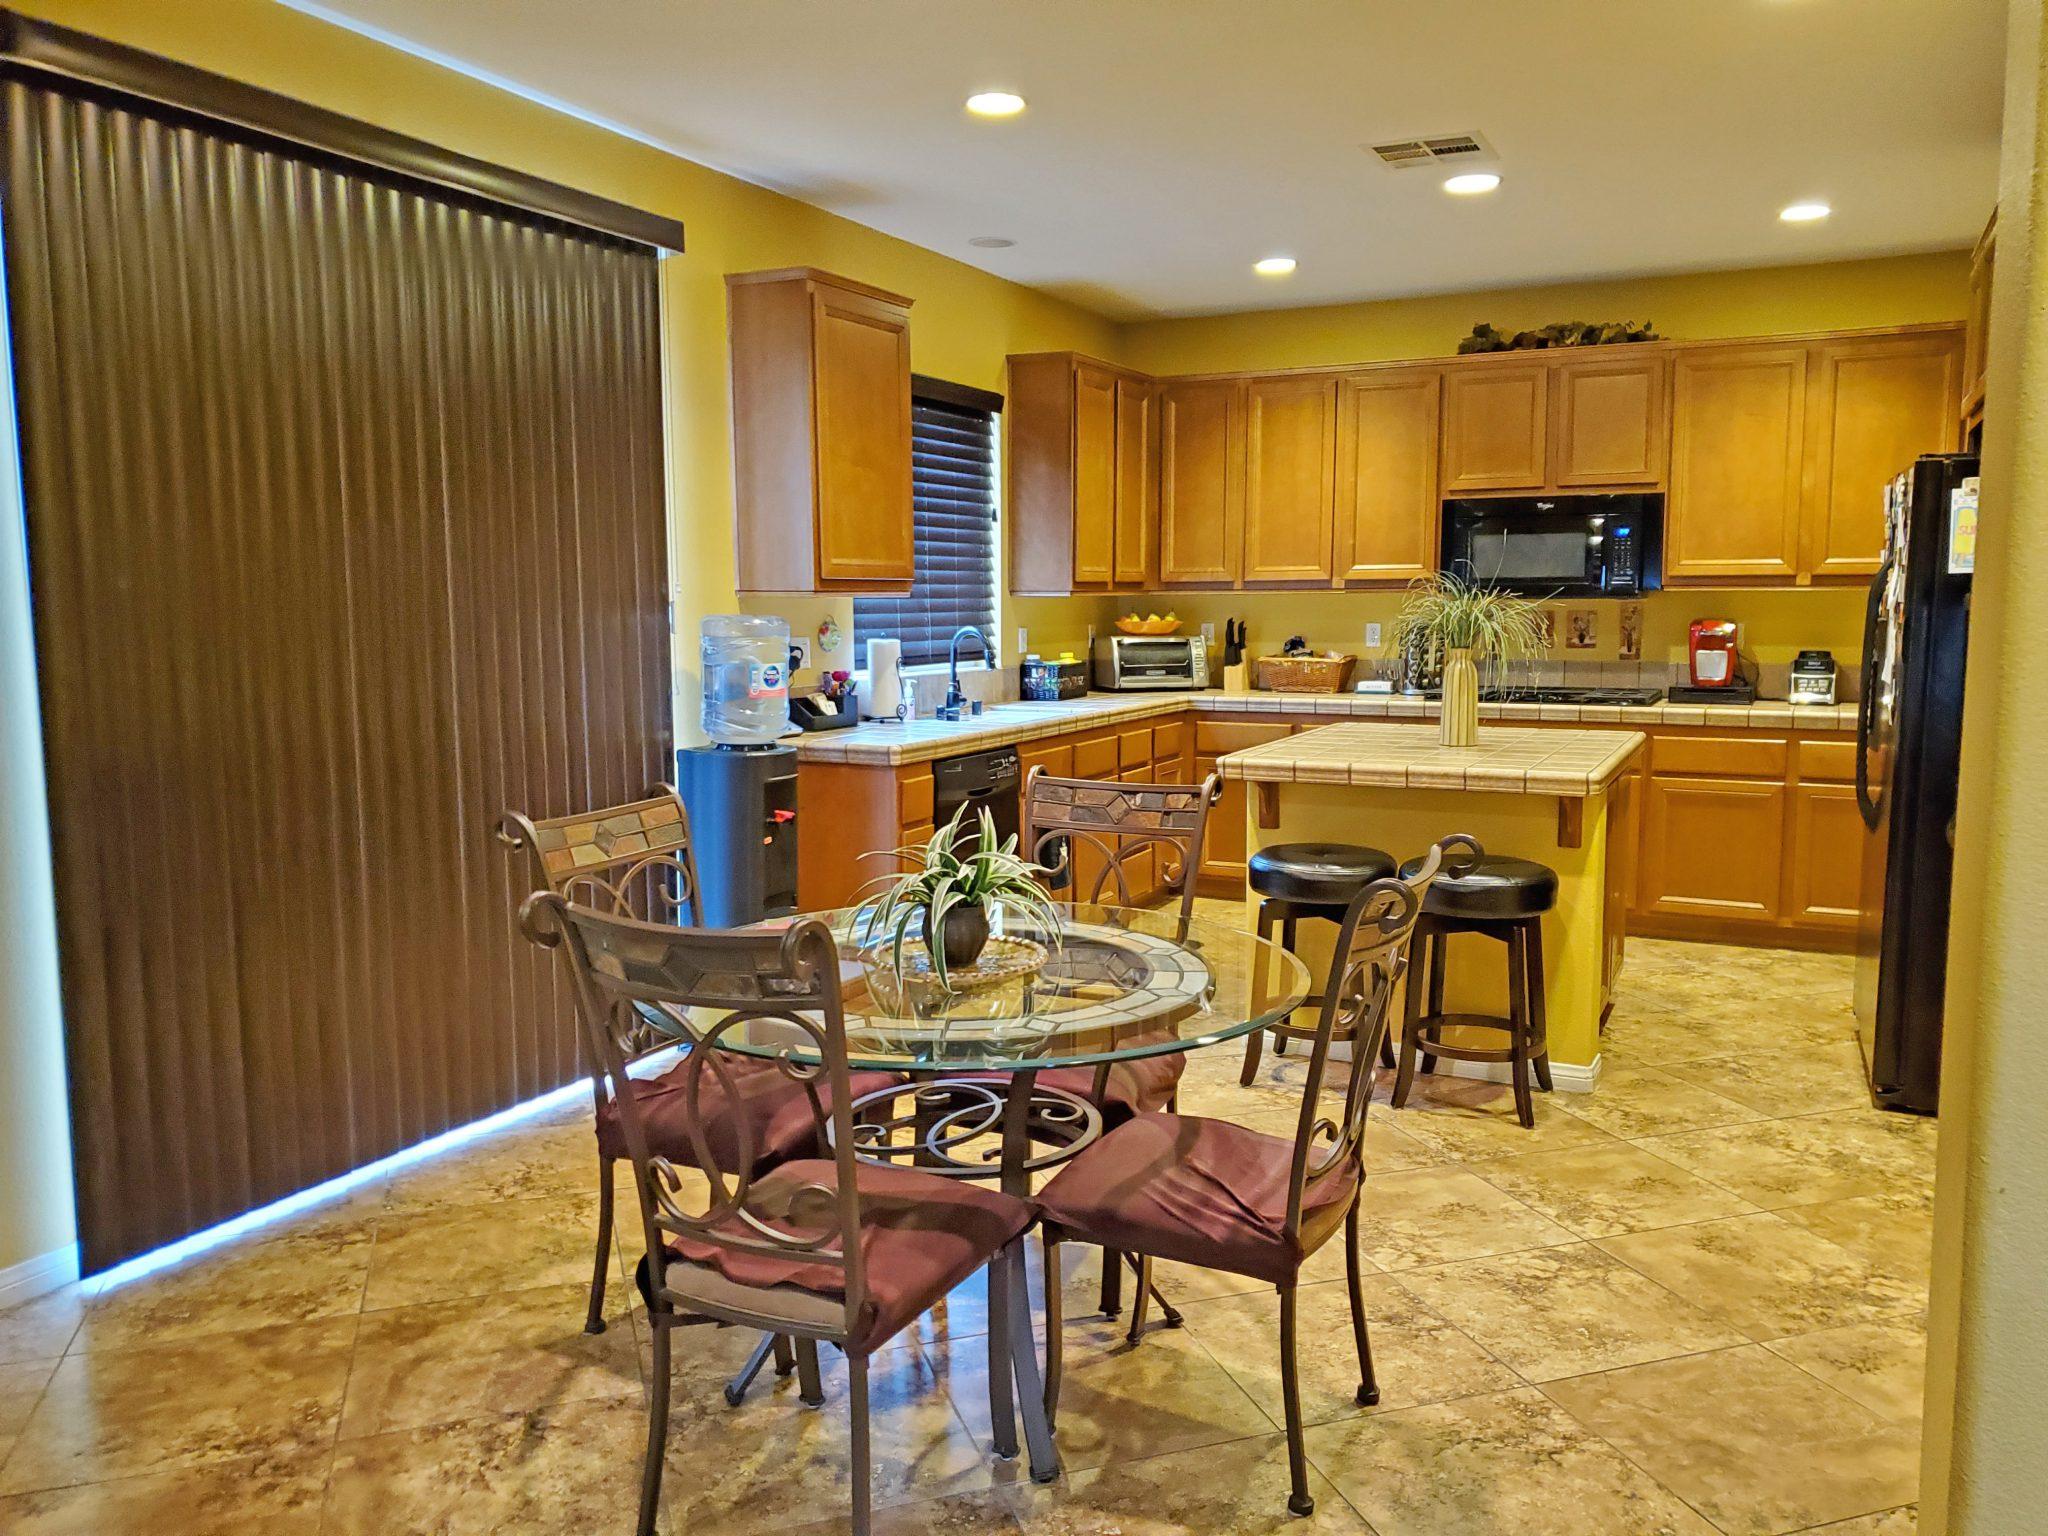 123 Boston Ave., Beaumont, Ca. 92223 Kitchen